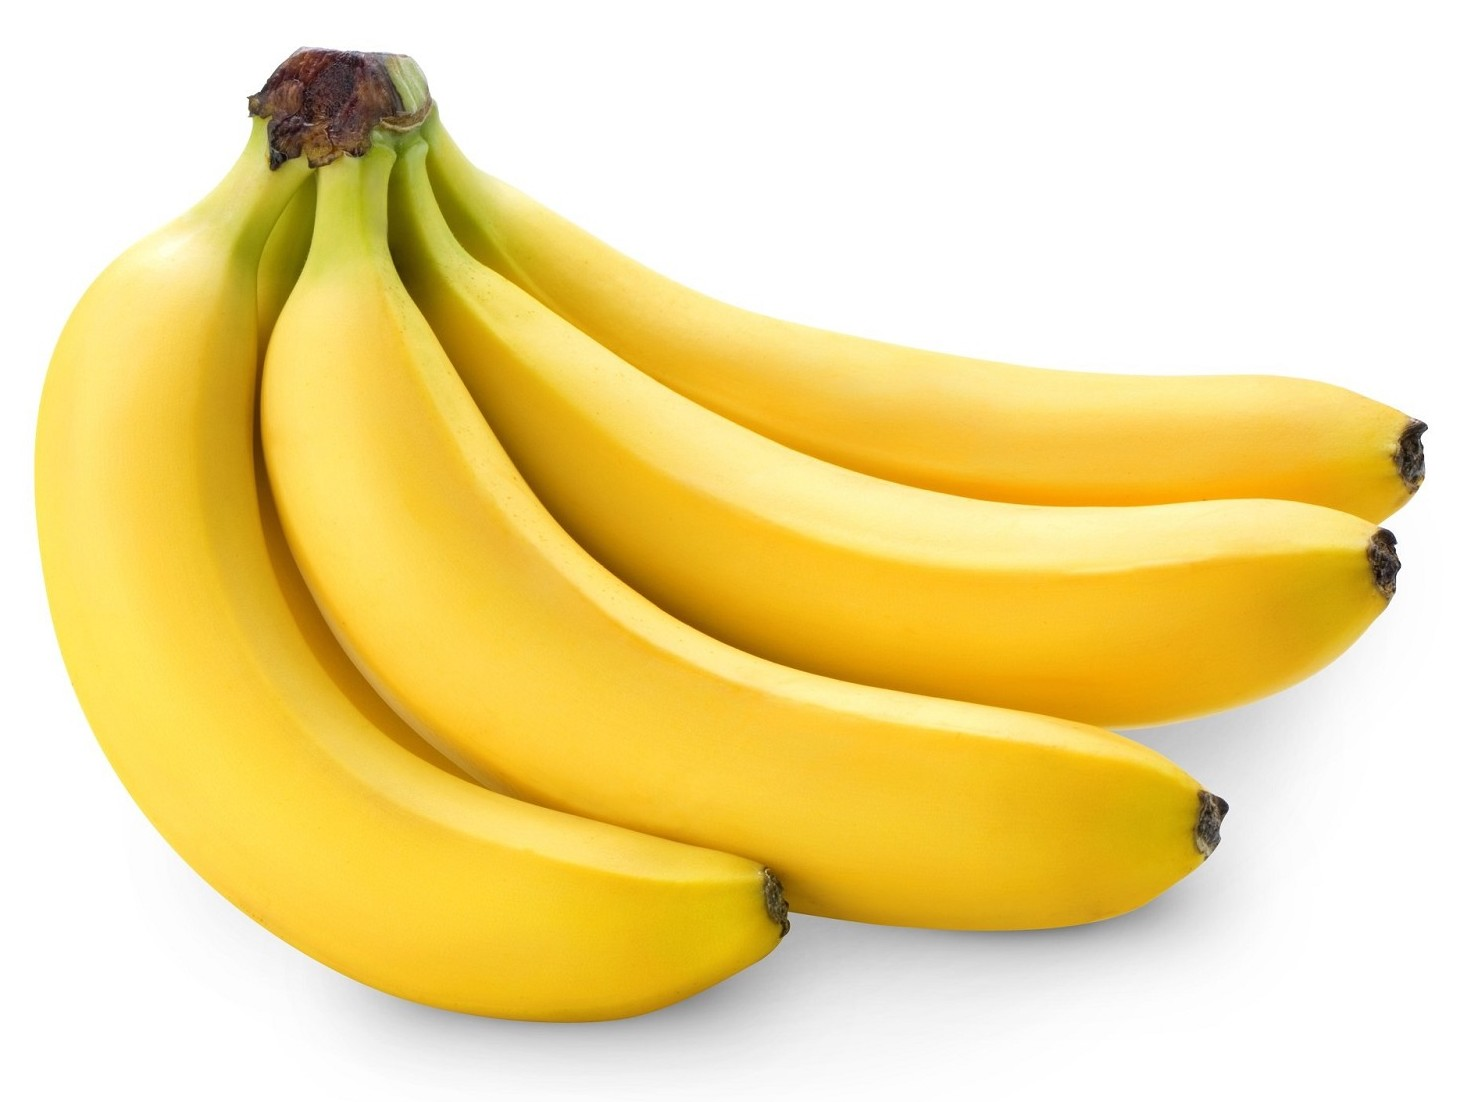 Dieta delle banane: dimagrire velocement